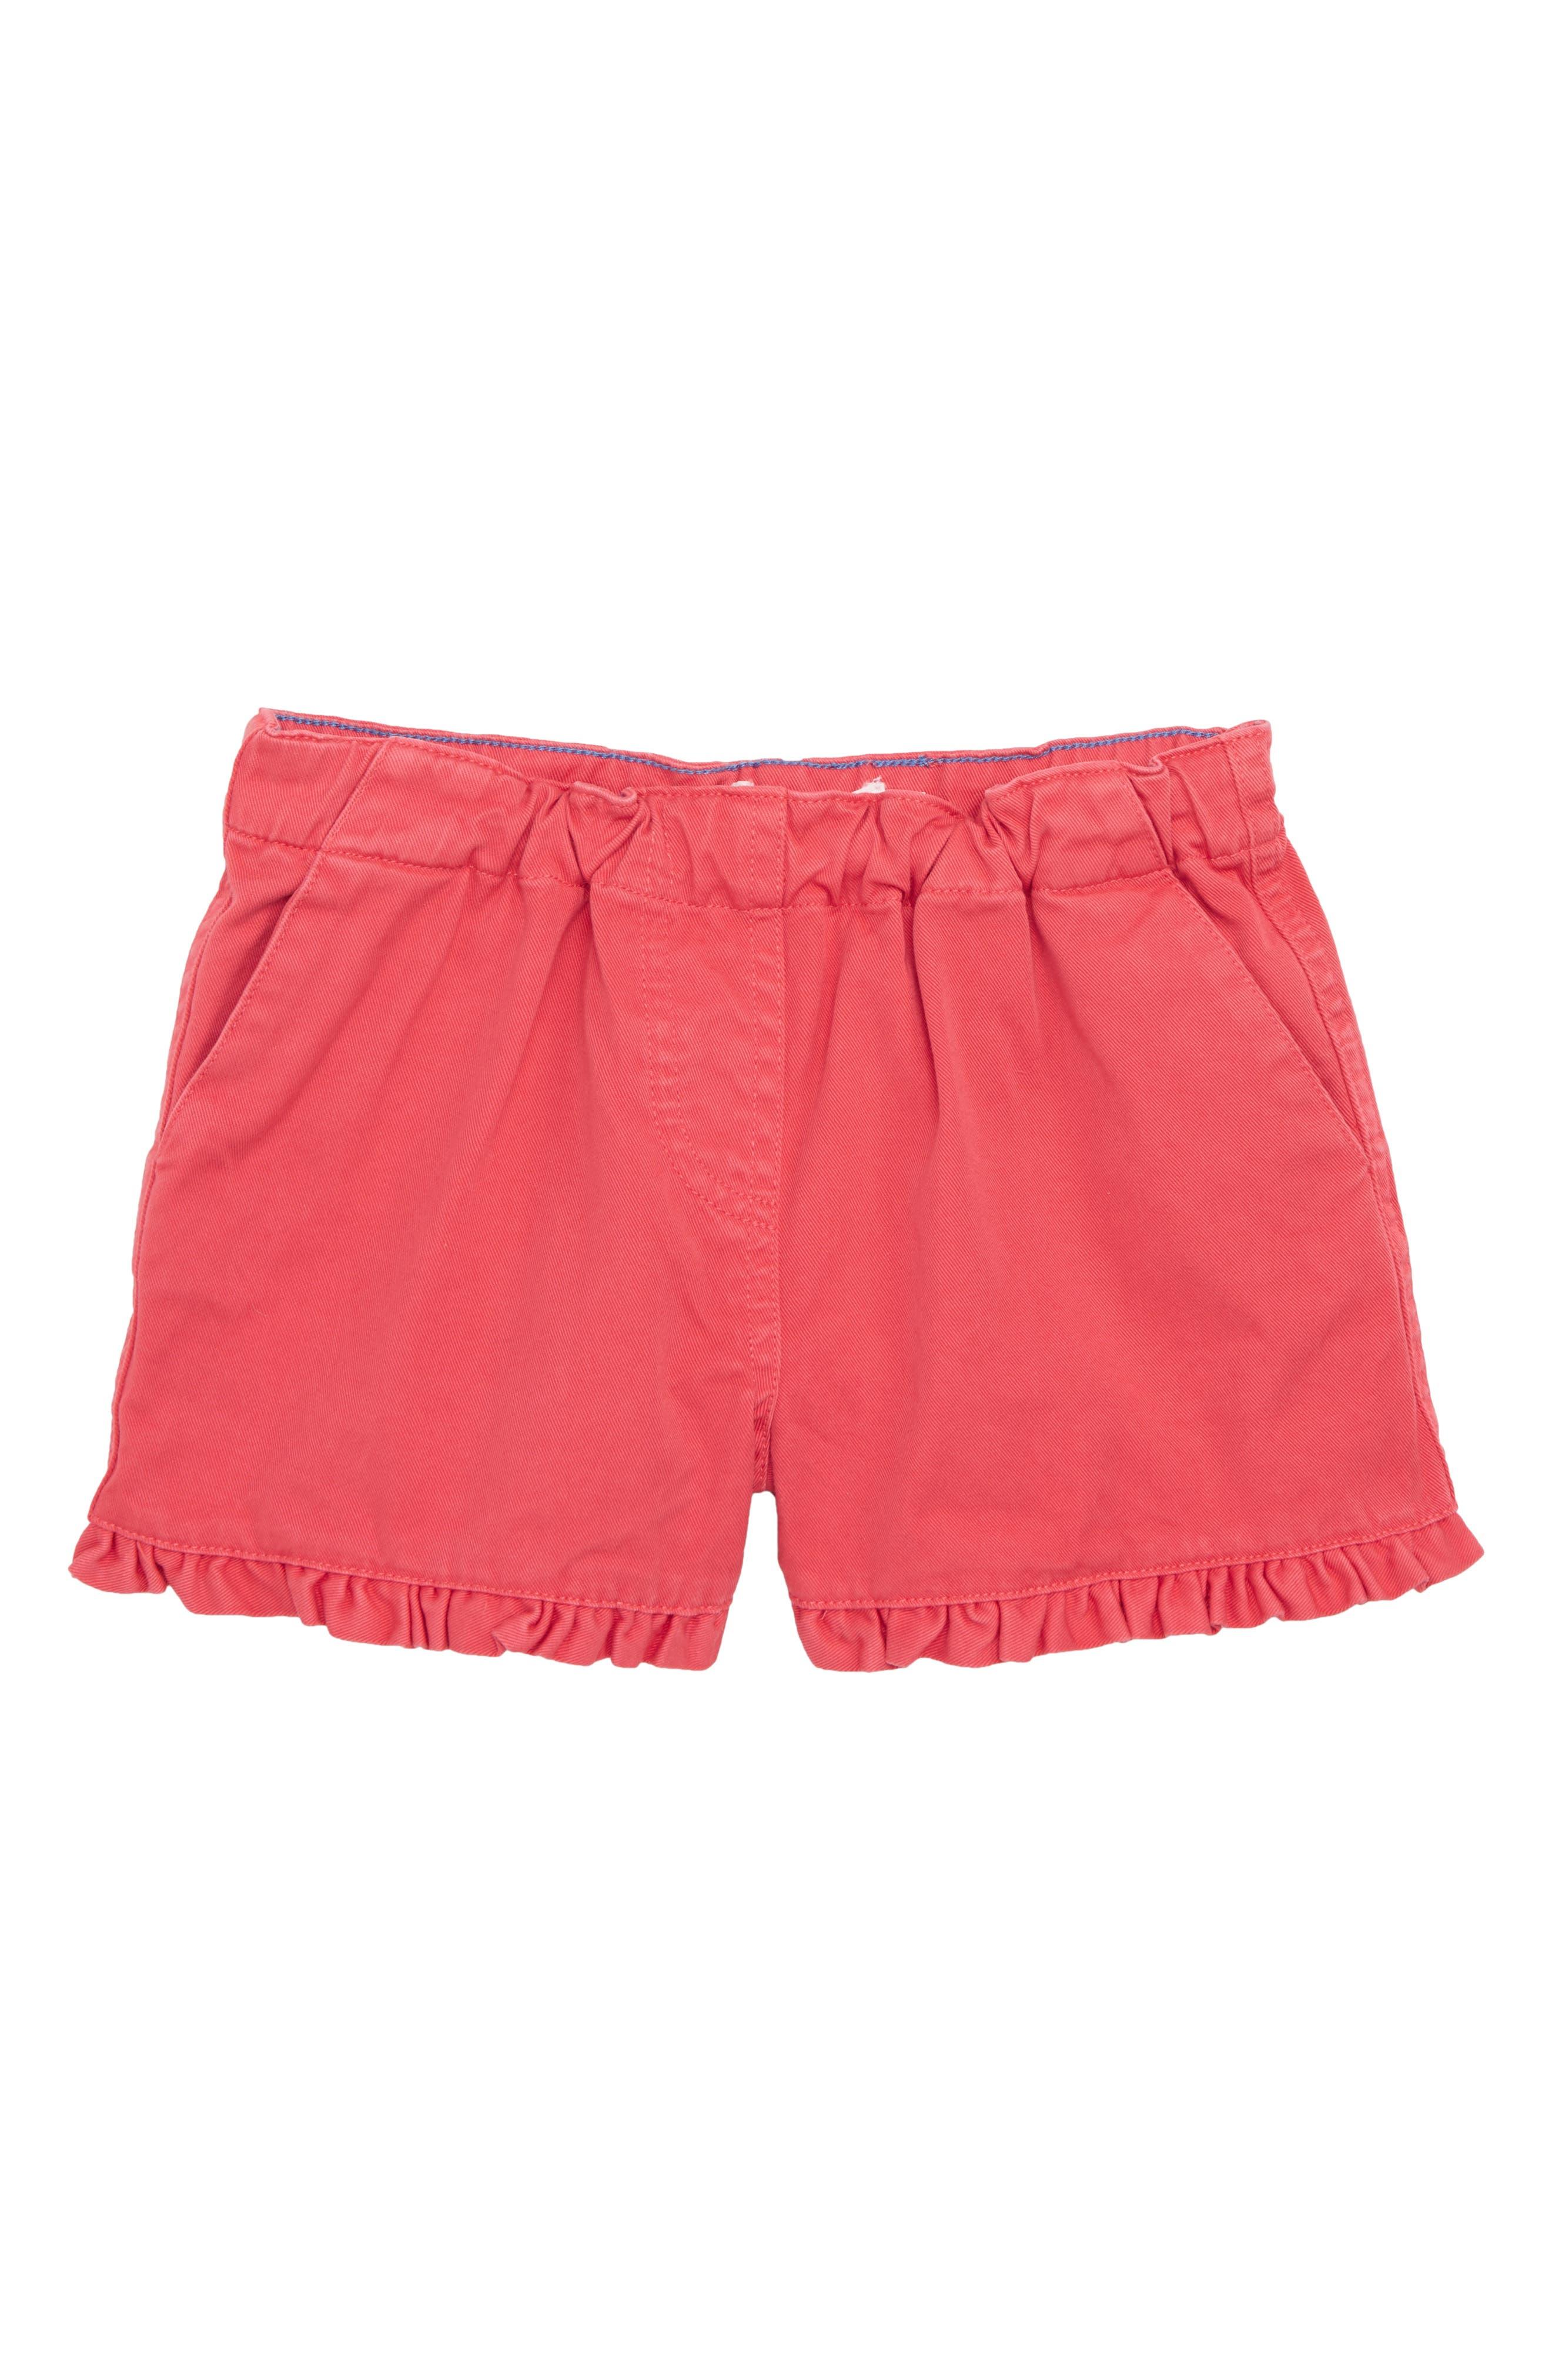 Frill Detail Shorts,                             Main thumbnail 1, color,                             Strawberry Split Pin